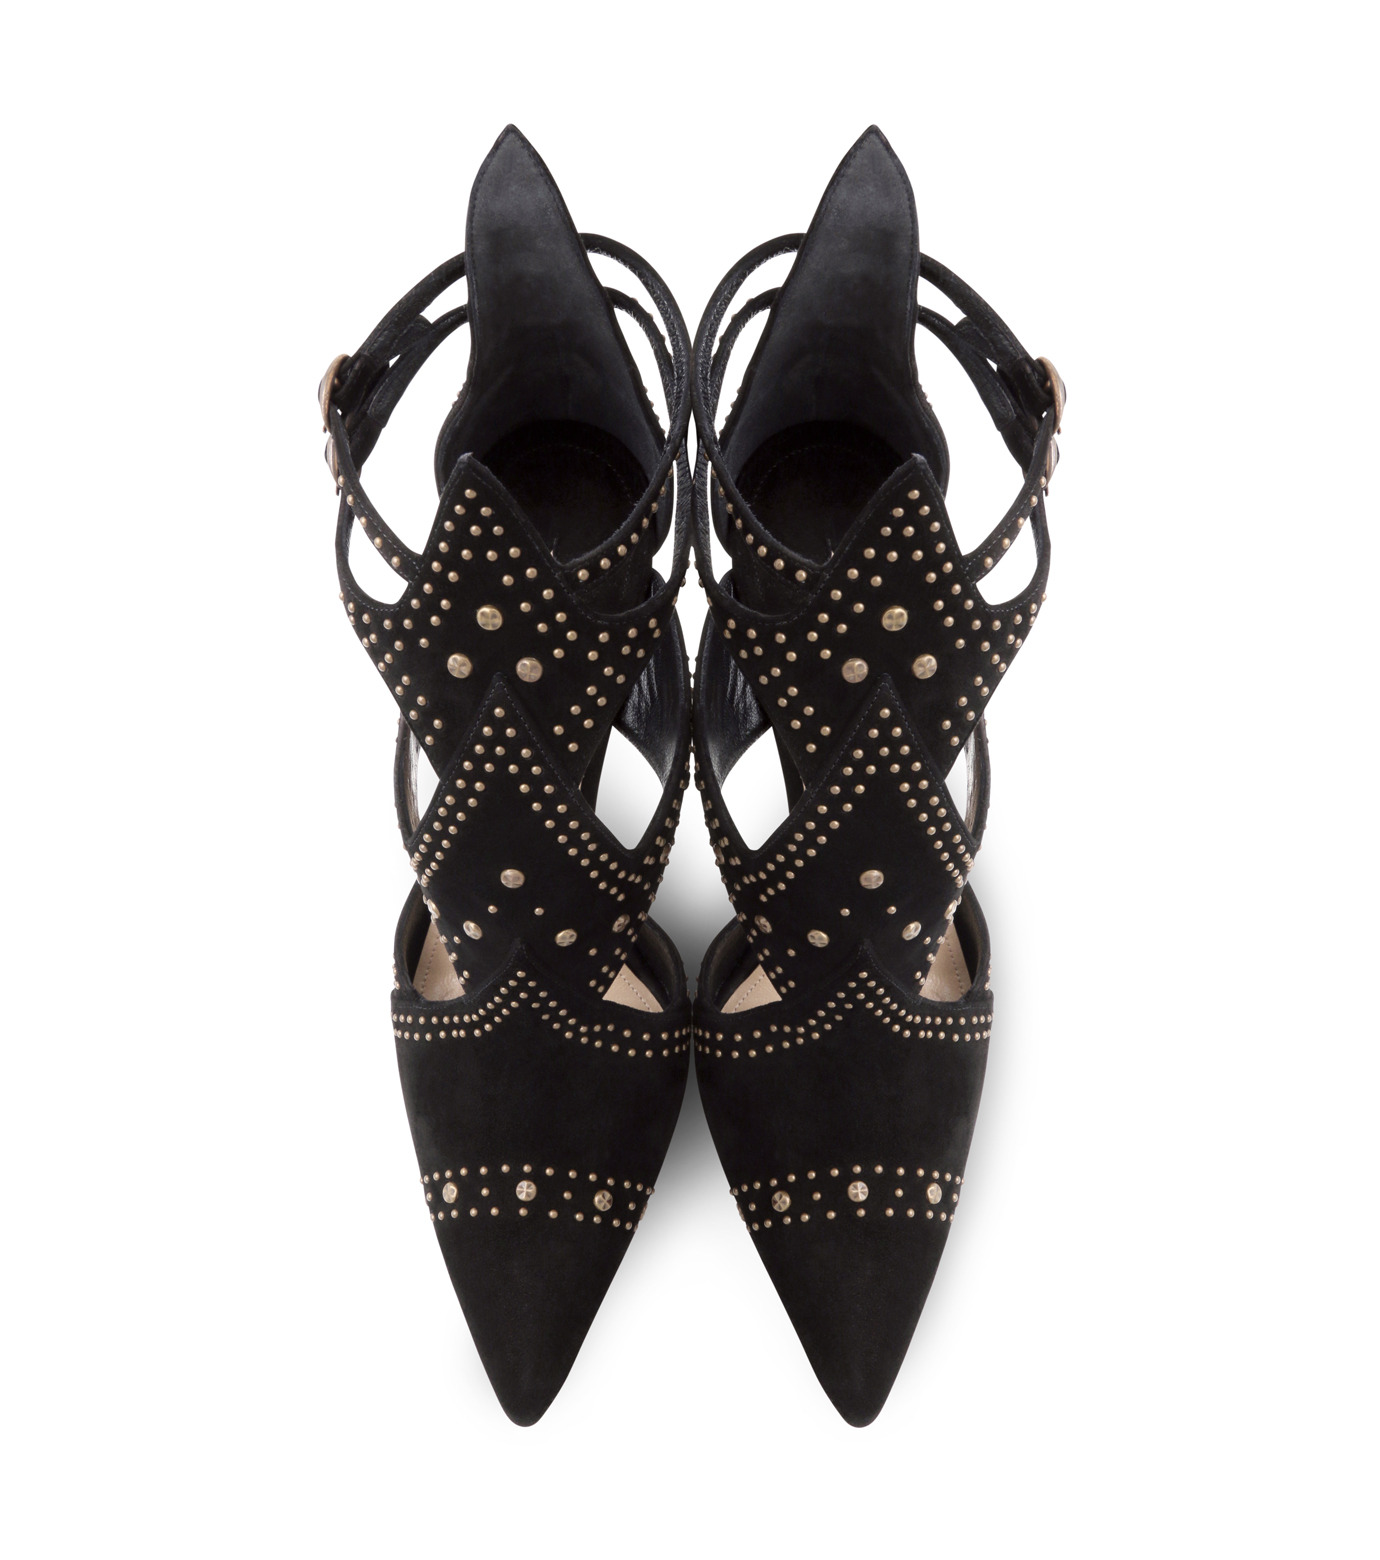 Paul Andrew(ポールアンドリュー)のpanel suede sandal w/studs-BLACK(シューズ/shoes)-314910-13 拡大詳細画像4